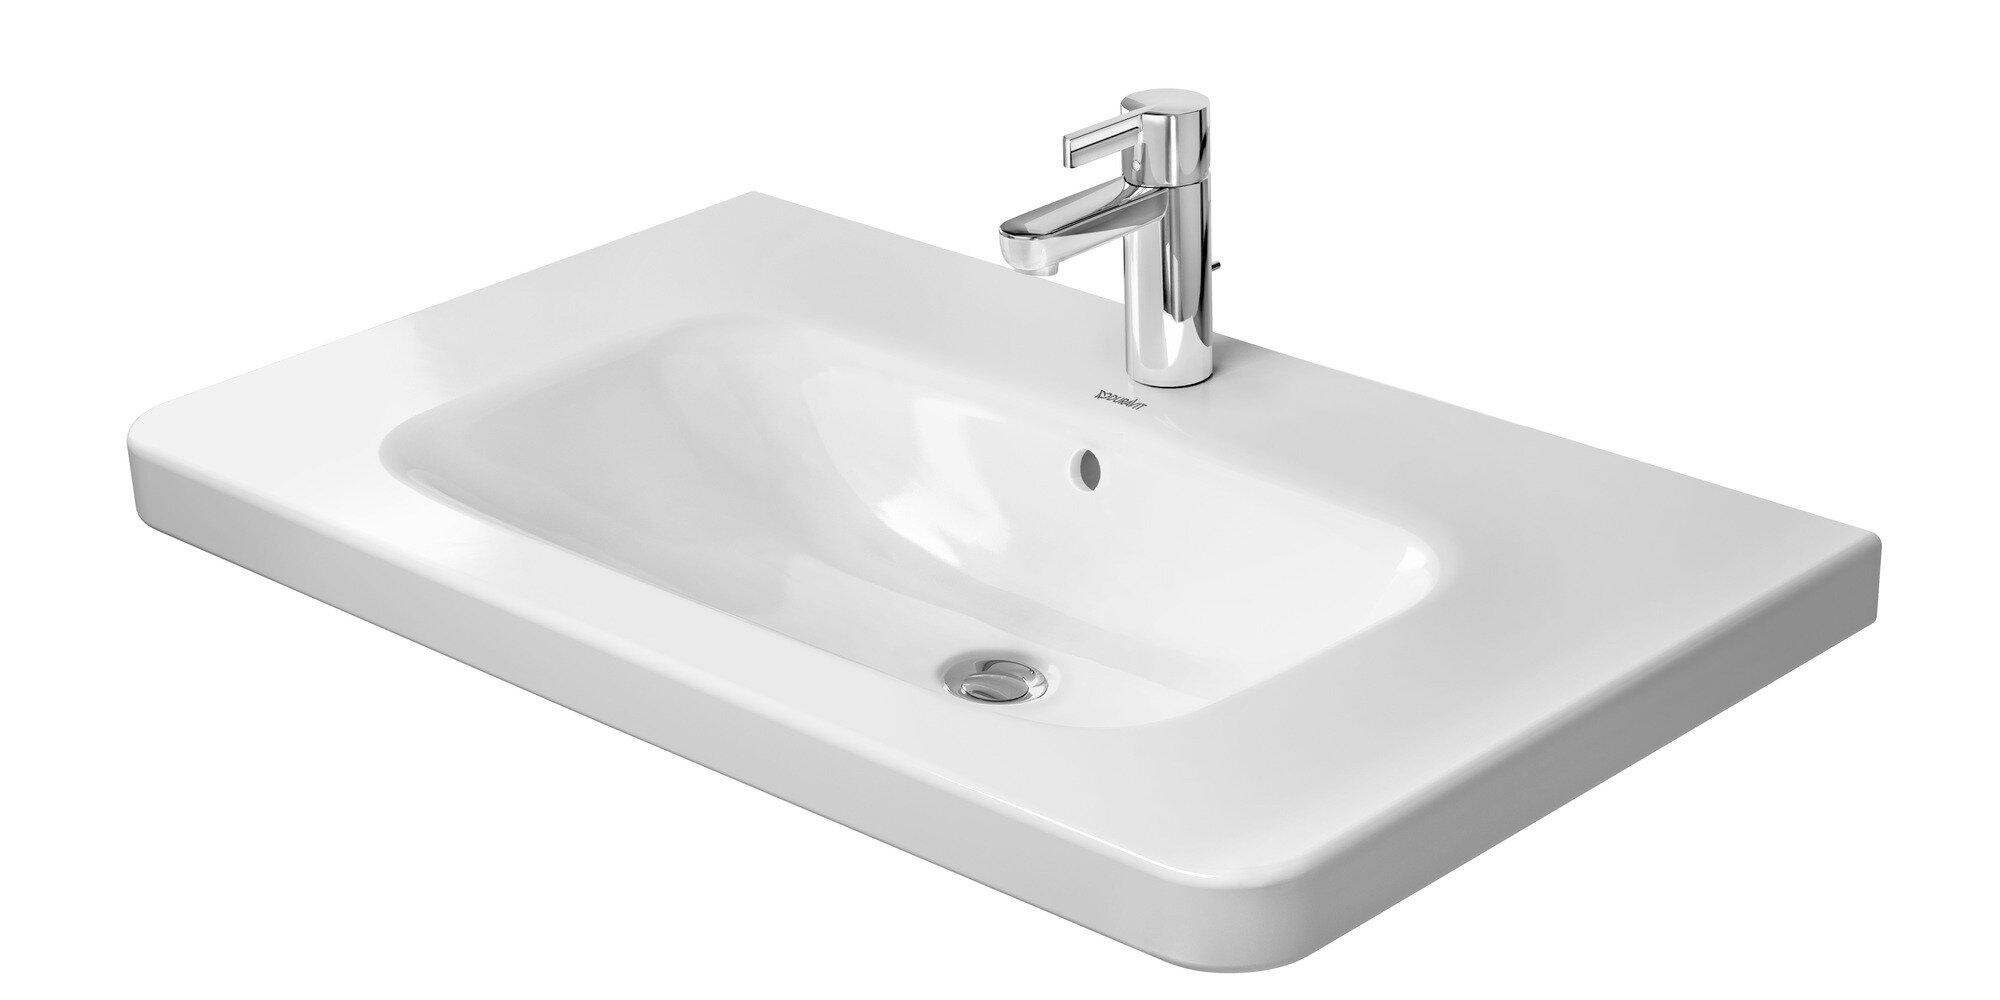 Duravit White Ceramic Rectangular Wall Mount Bathroom Sink With Overflow Wayfair